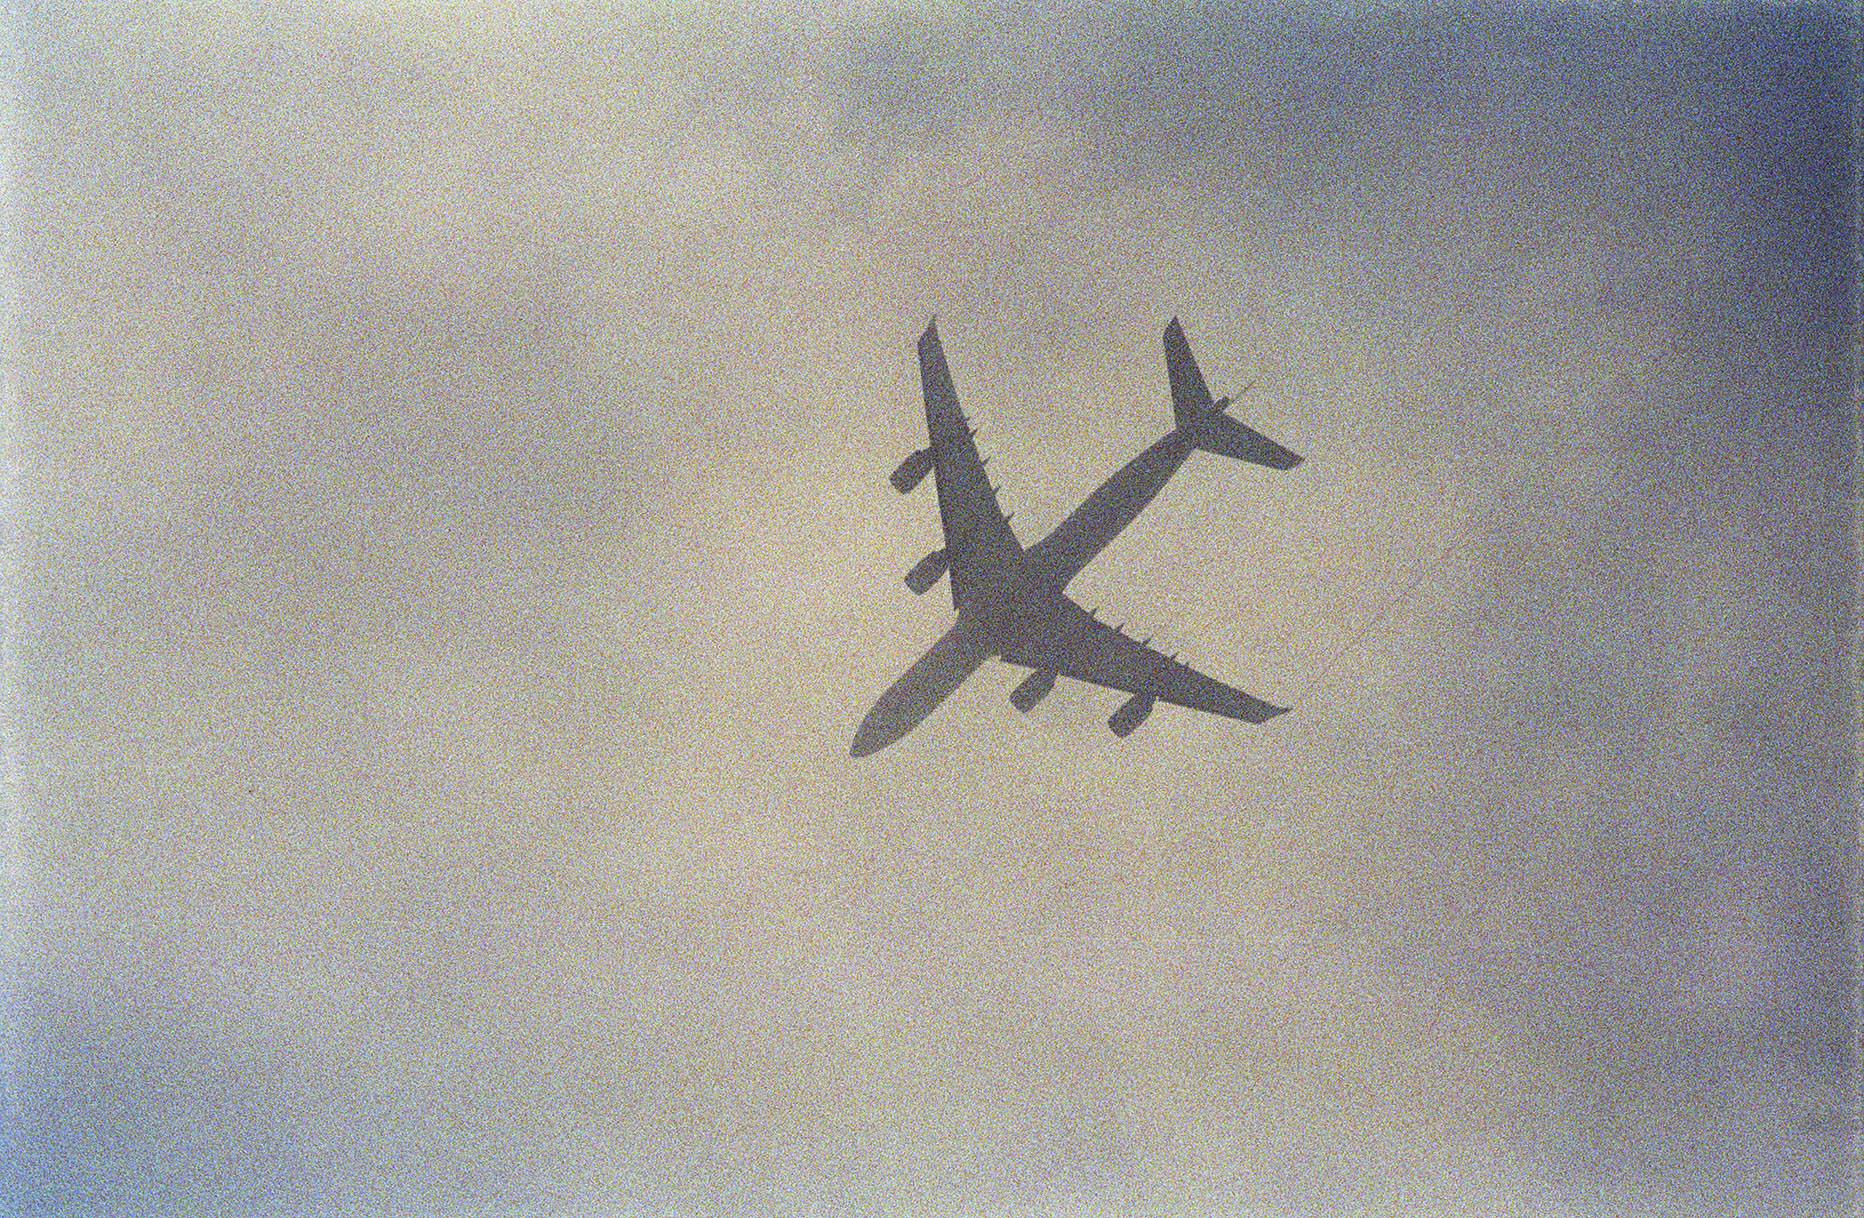 ghost_plane.jpg